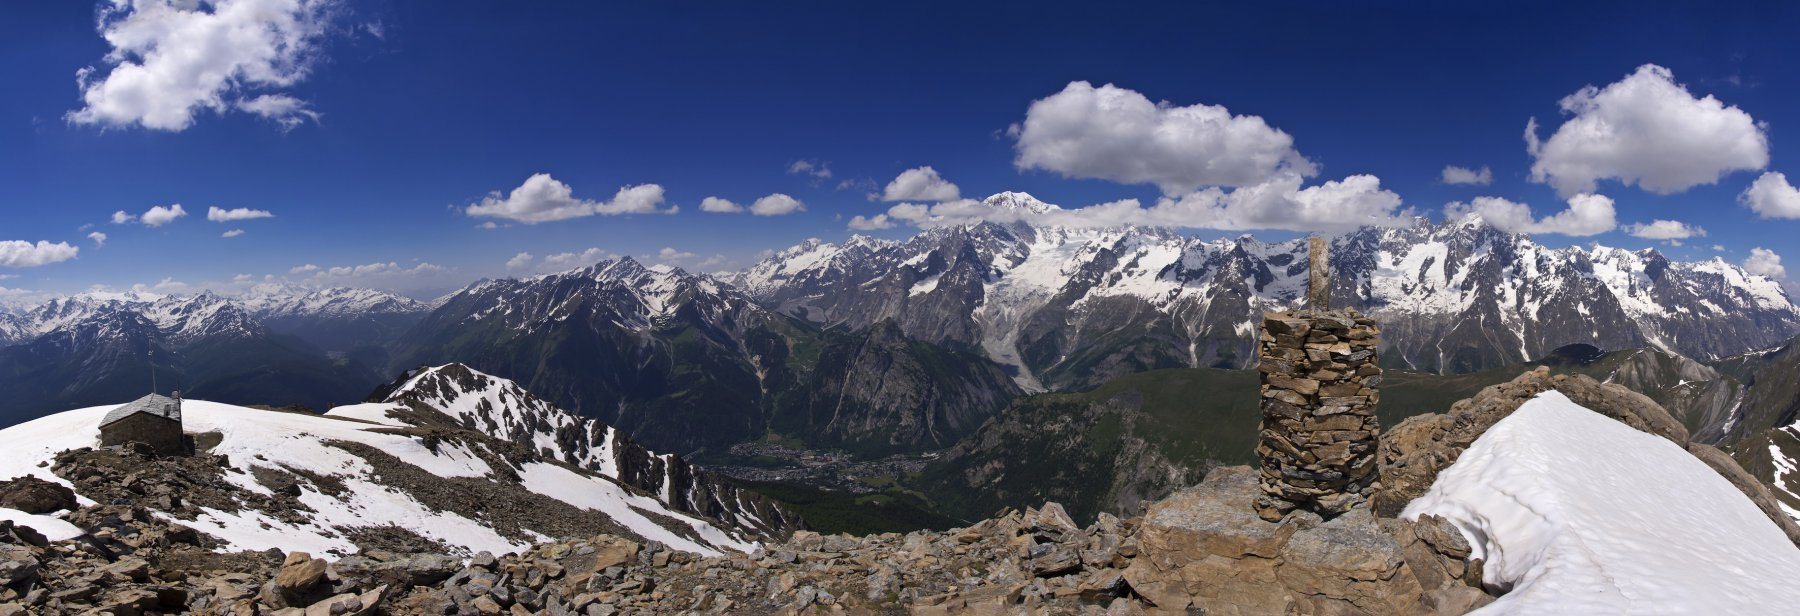 Panoramica 180° (Photomerge)